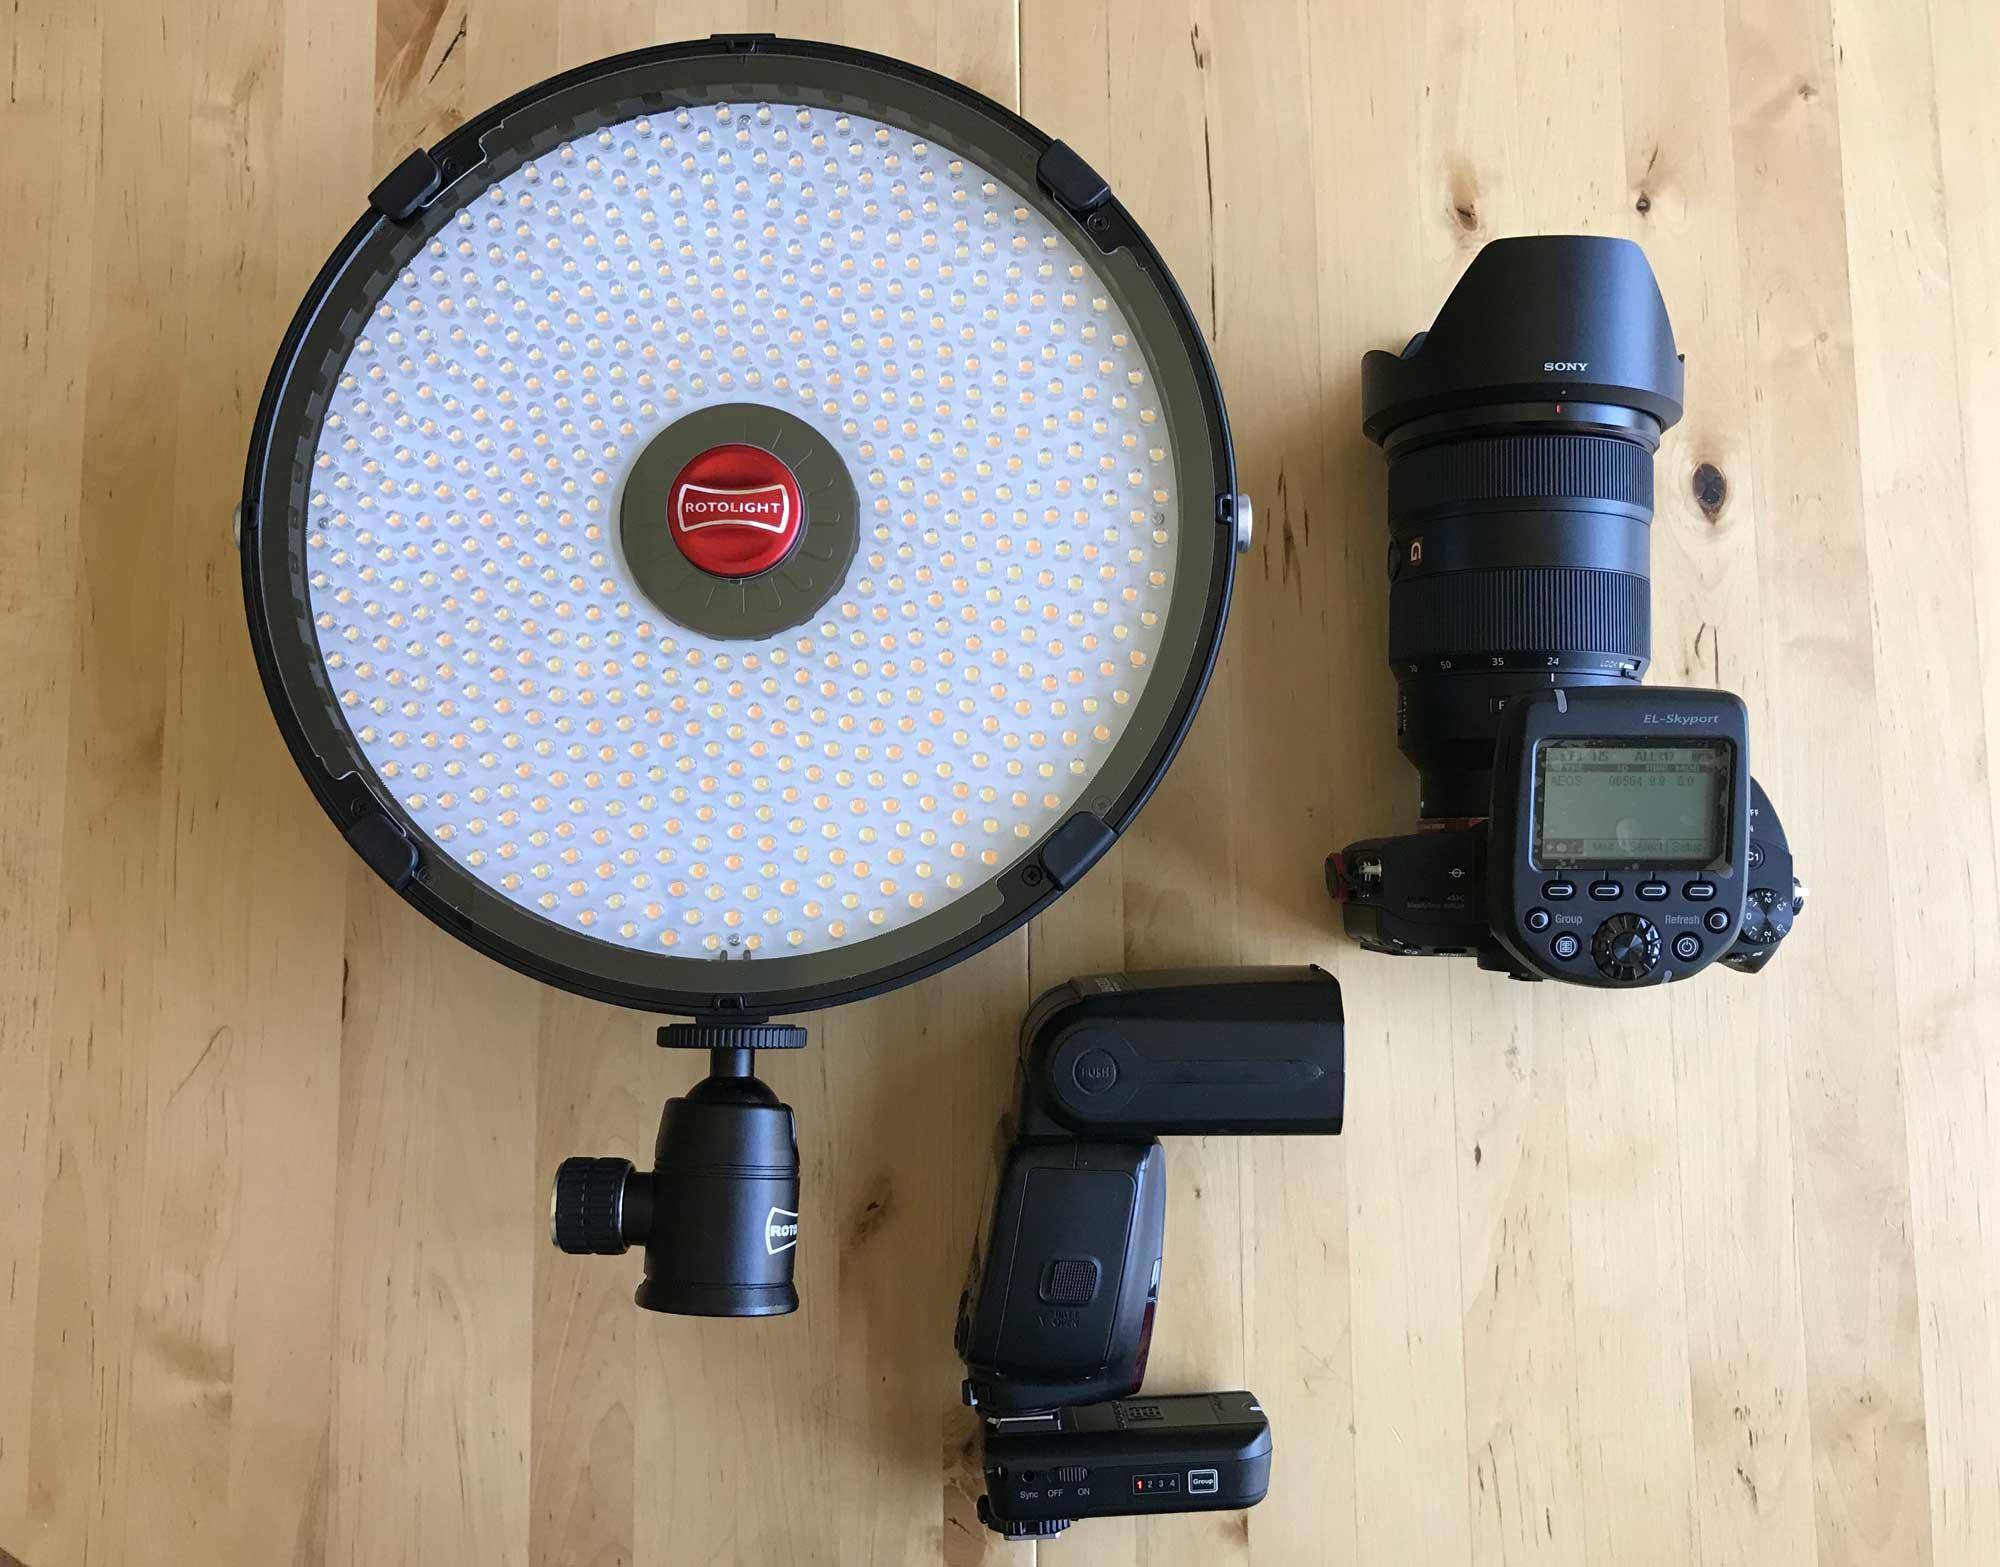 Elinchrom-EL-Skyport-Sony-Canon-Rotolight-Combined.jpg